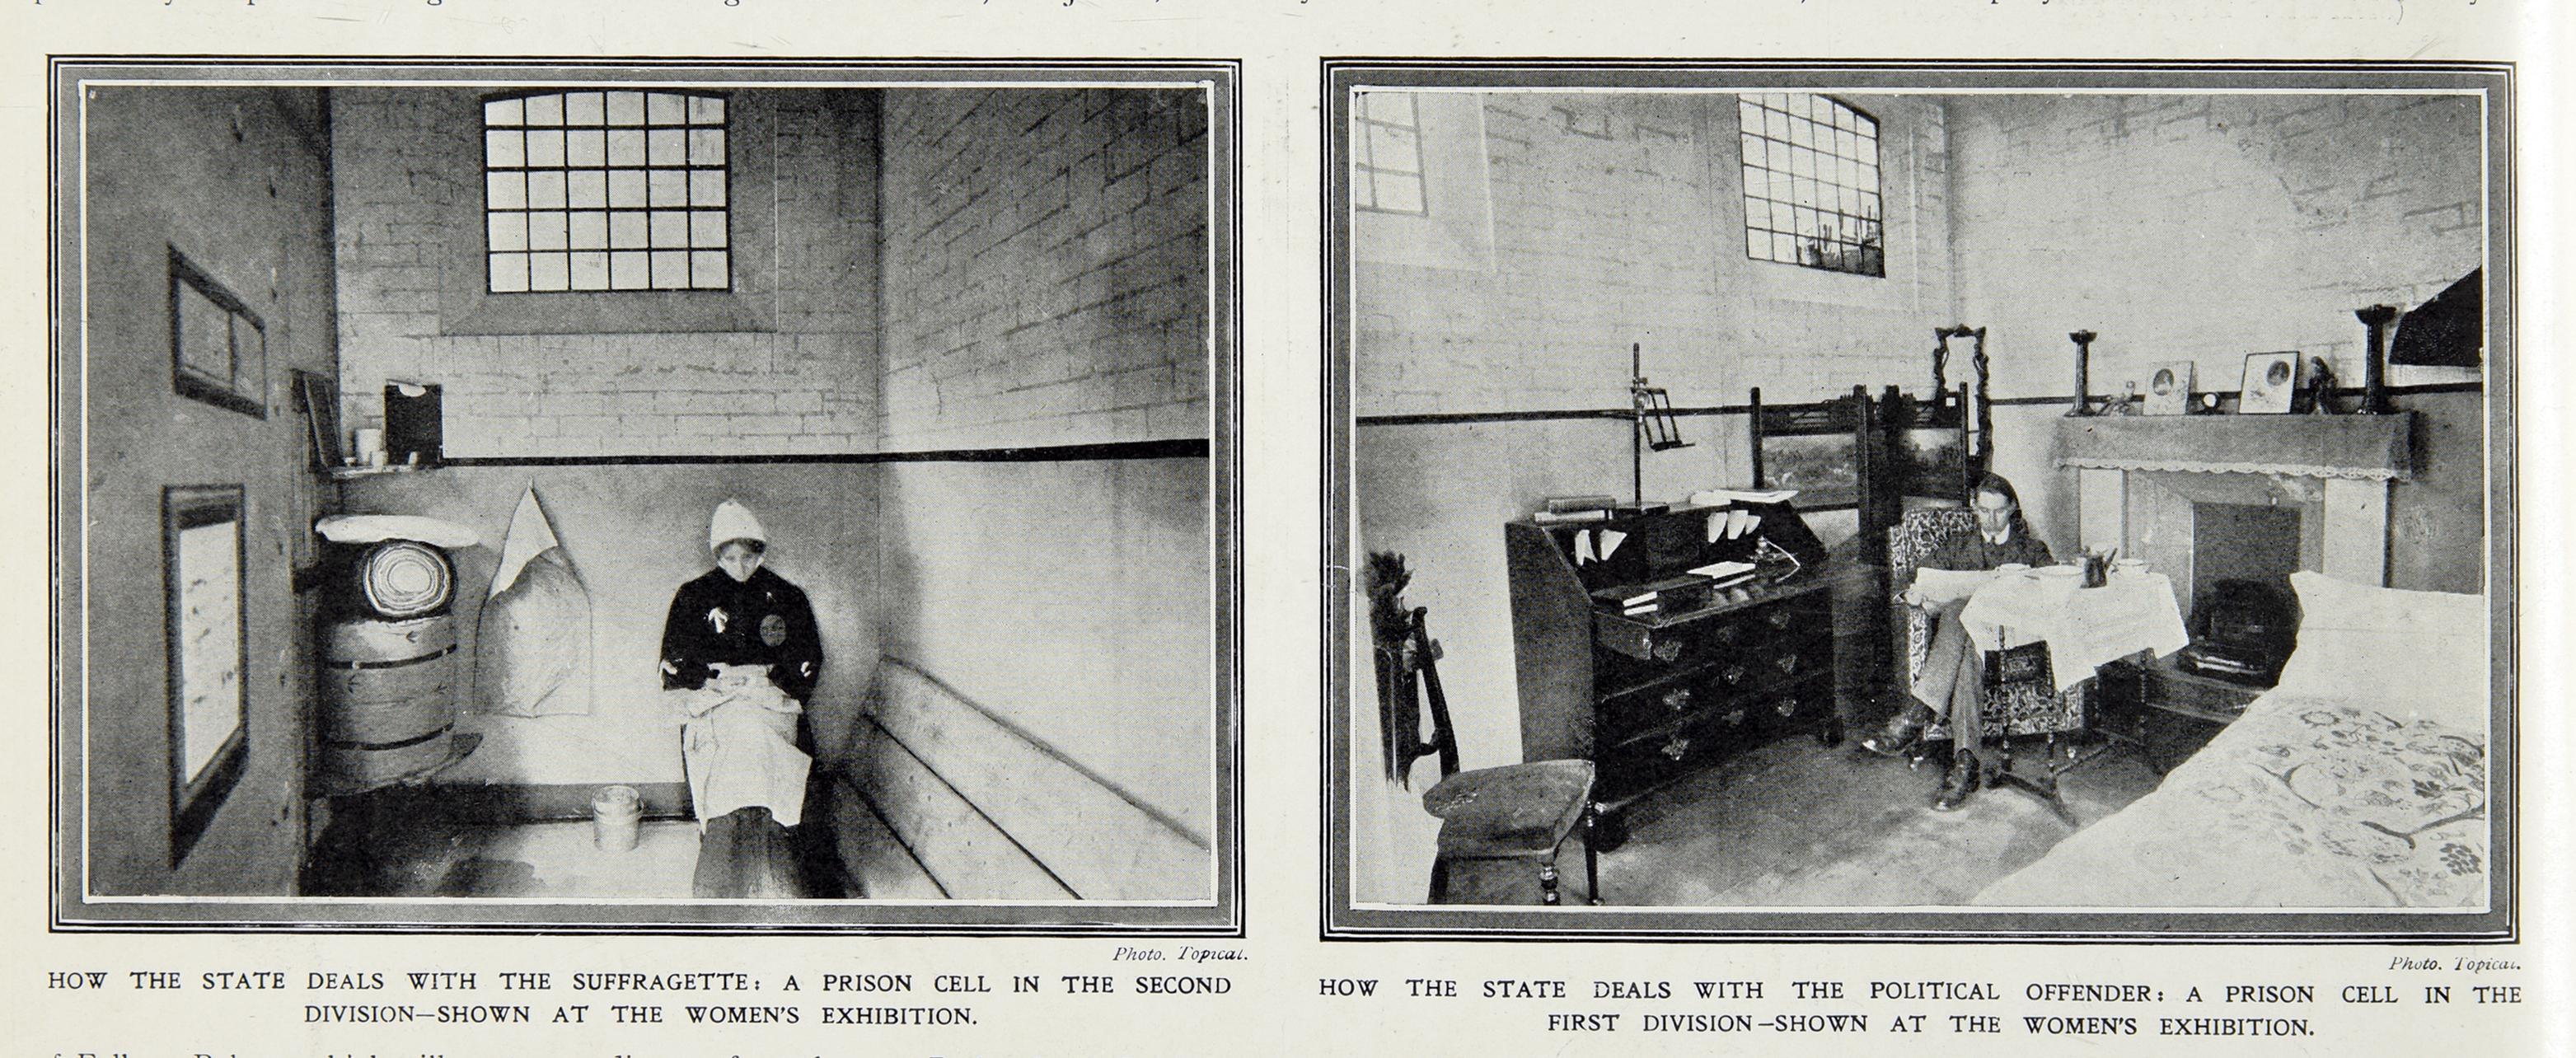 Images of prison cells ZPER 34/134